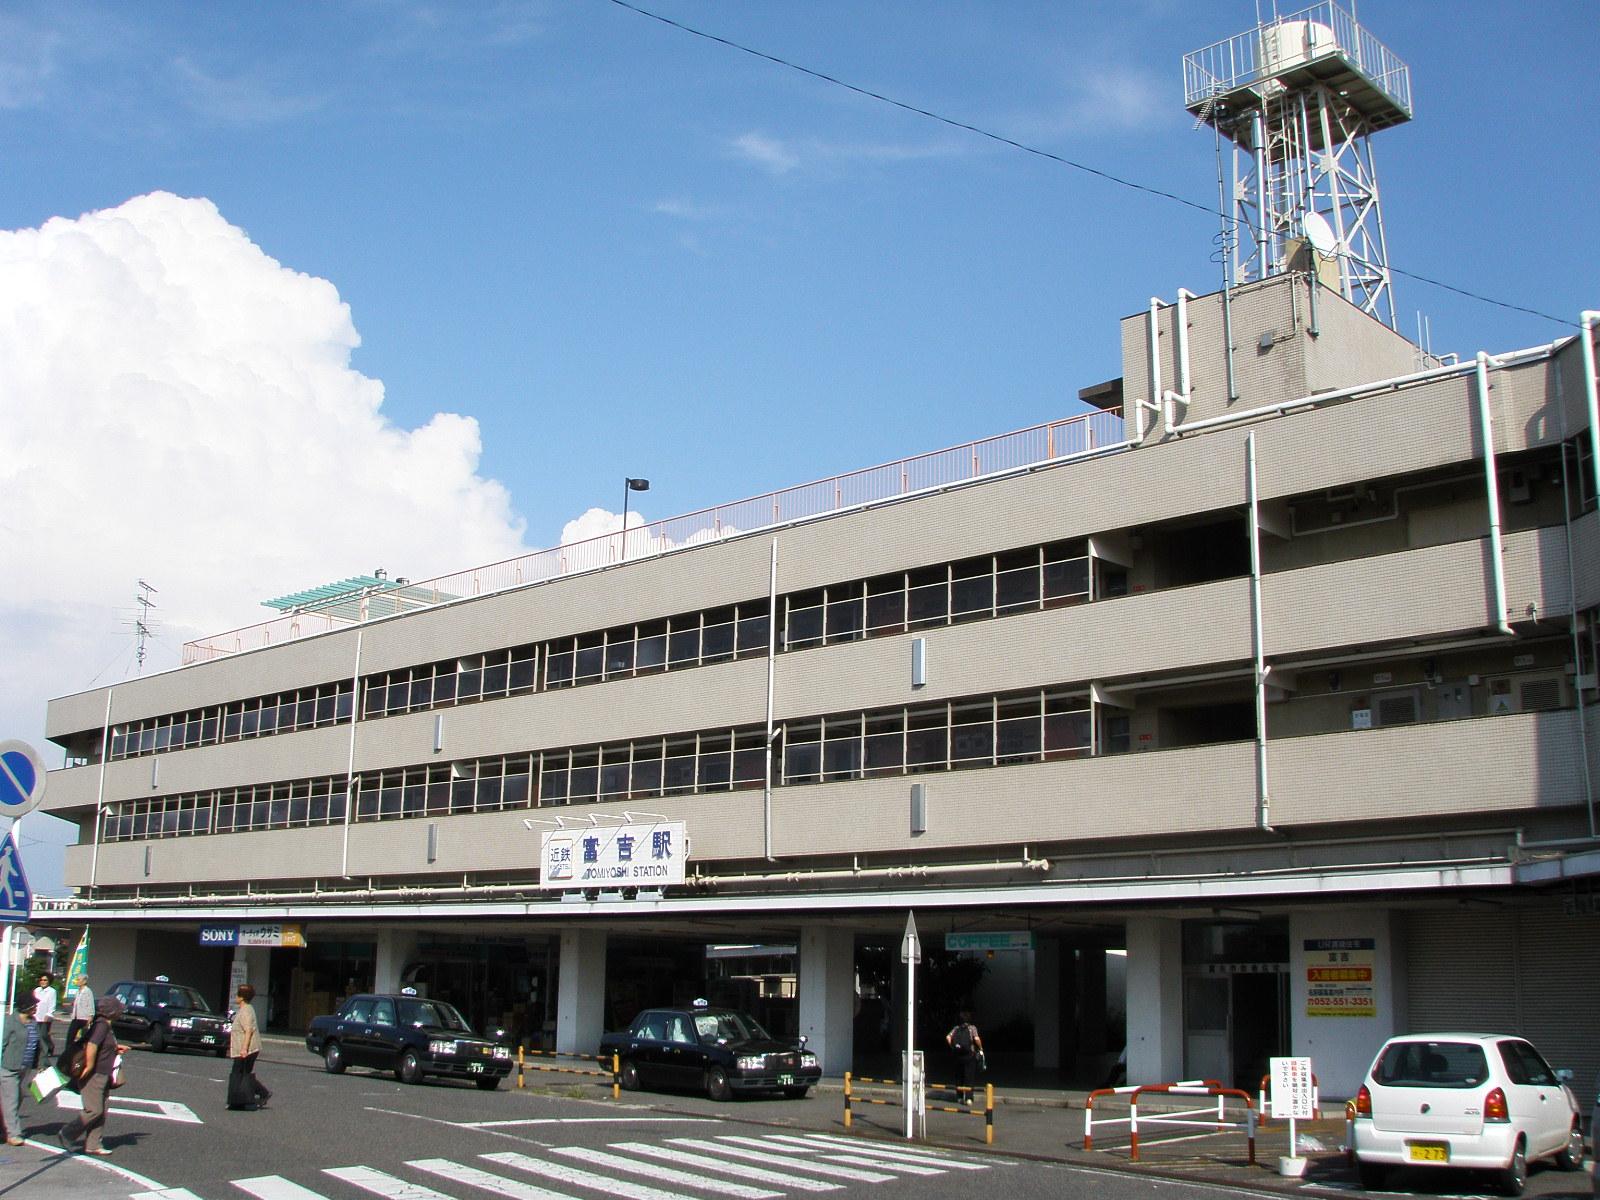 https://upload.wikimedia.org/wikipedia/commons/f/f7/KT-TomiyoshiStation-NorthGate.jpg